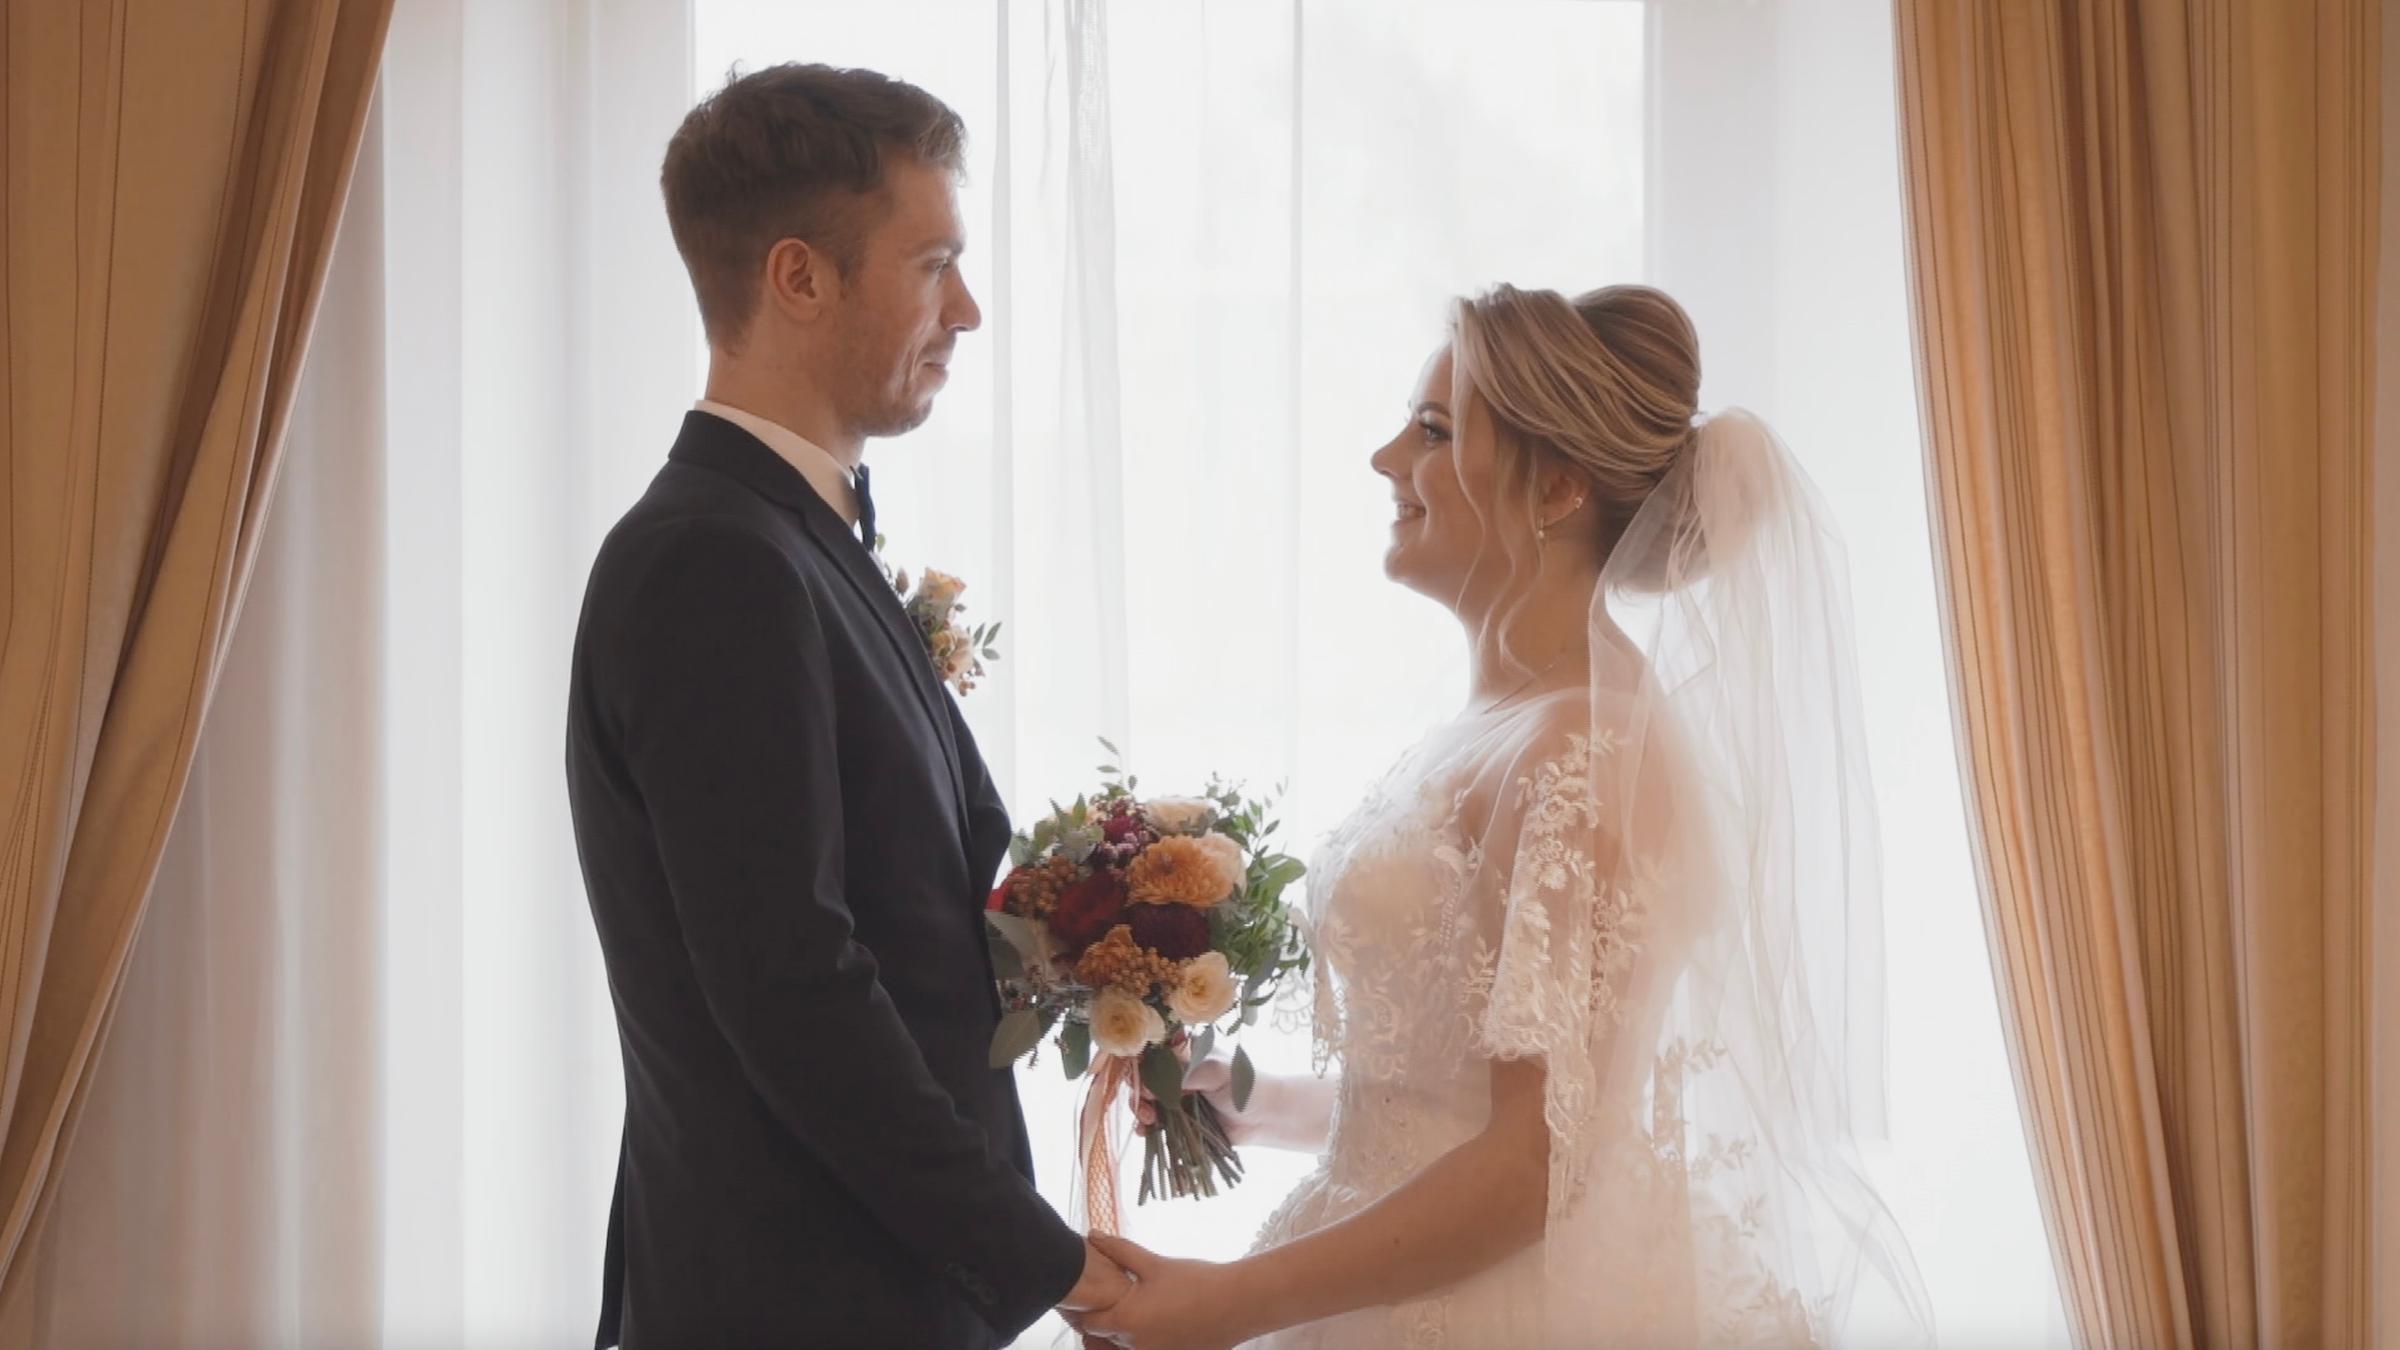 Russen frauen heiraten